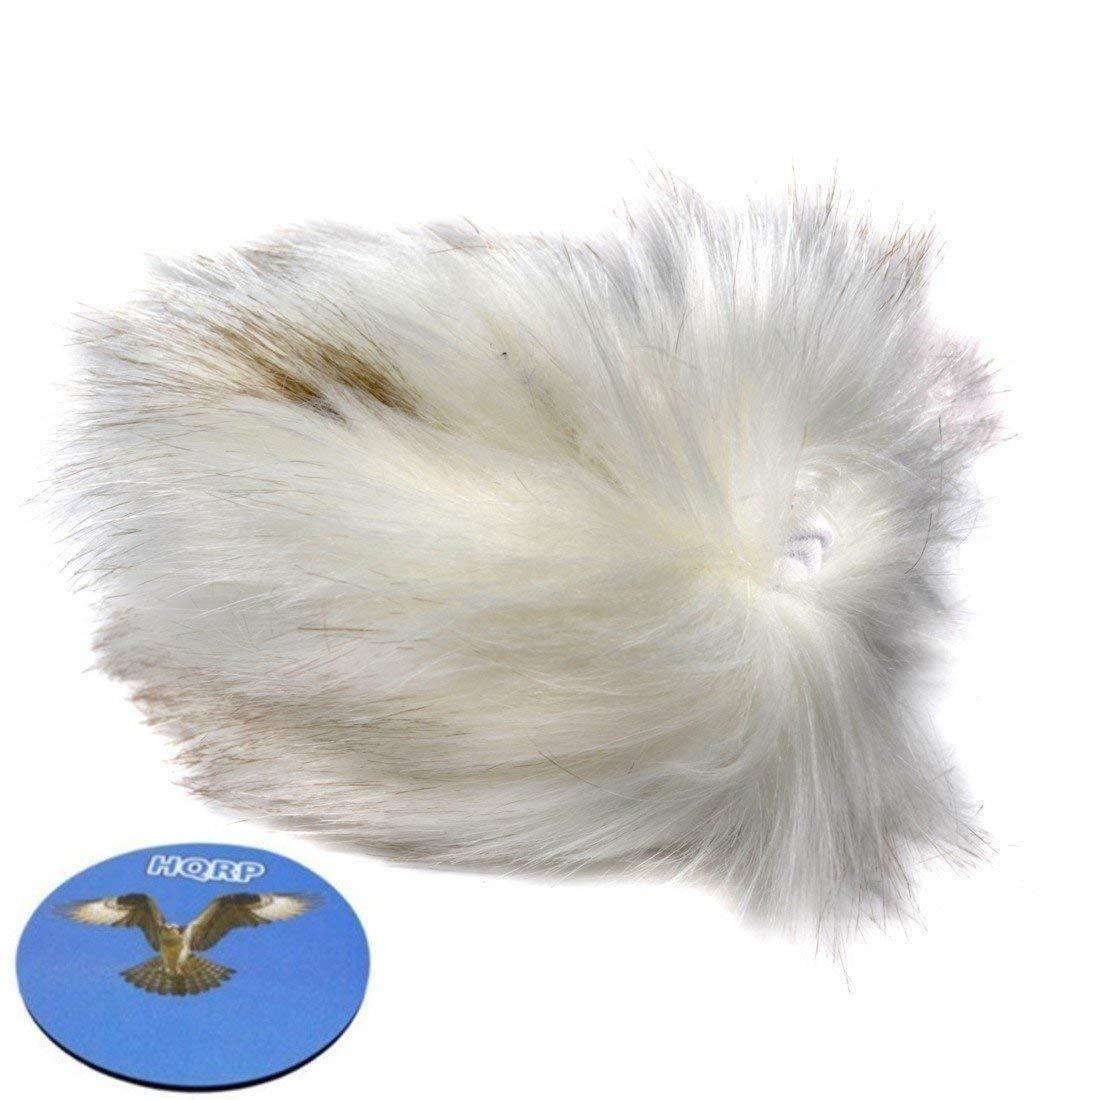 HQRP Outdoor Furry Microphone Windscreen Wind Screen Muff for MXL 990 plus HQRP Coaster